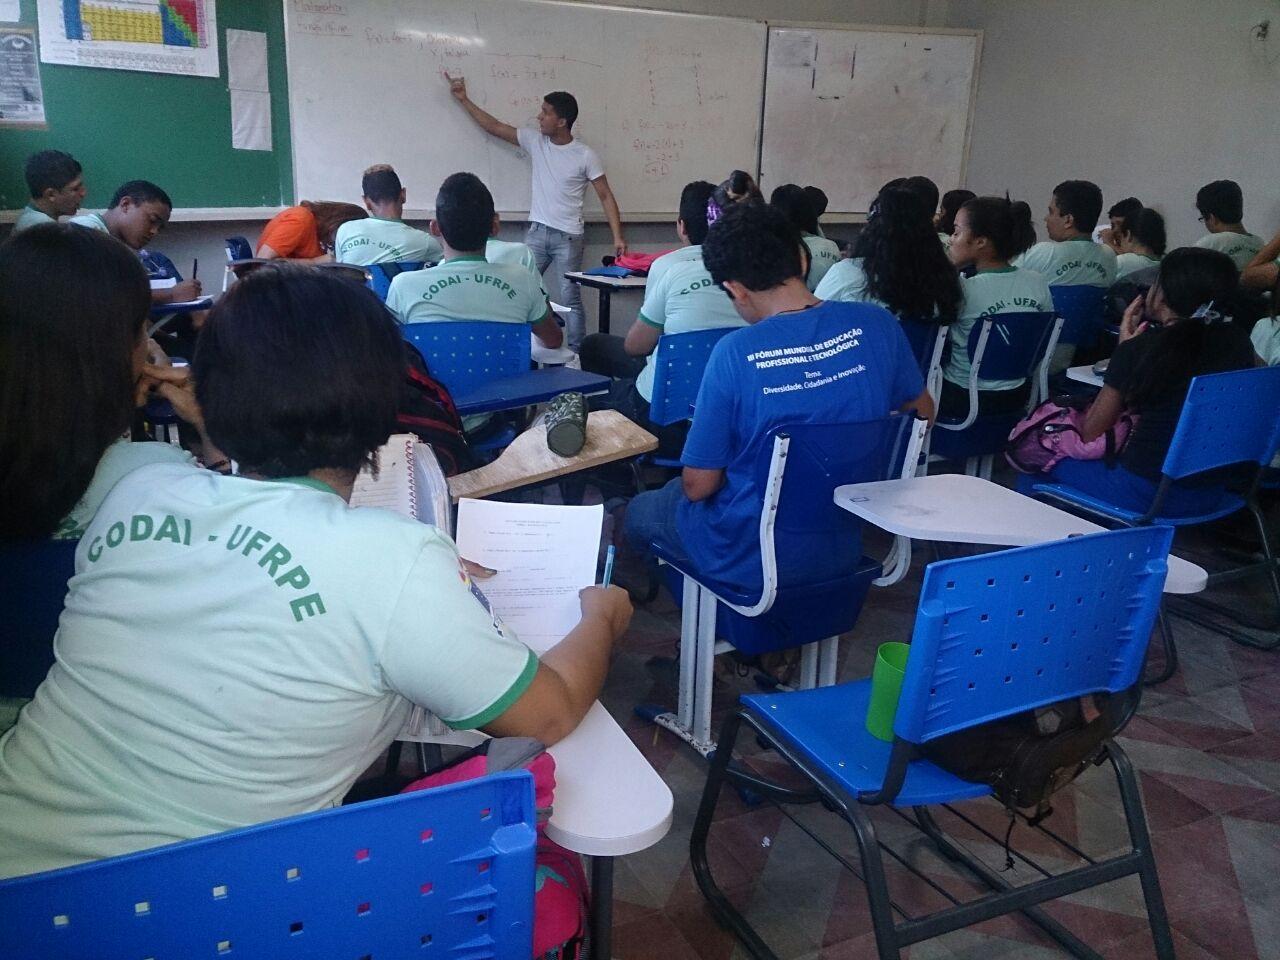 C:\Users\Angela\Dropbox\PIBID_Matemática_ID\IDs\Luiz Felipe\Produções\Fotos\IMG-20150703-WA0018.jpg